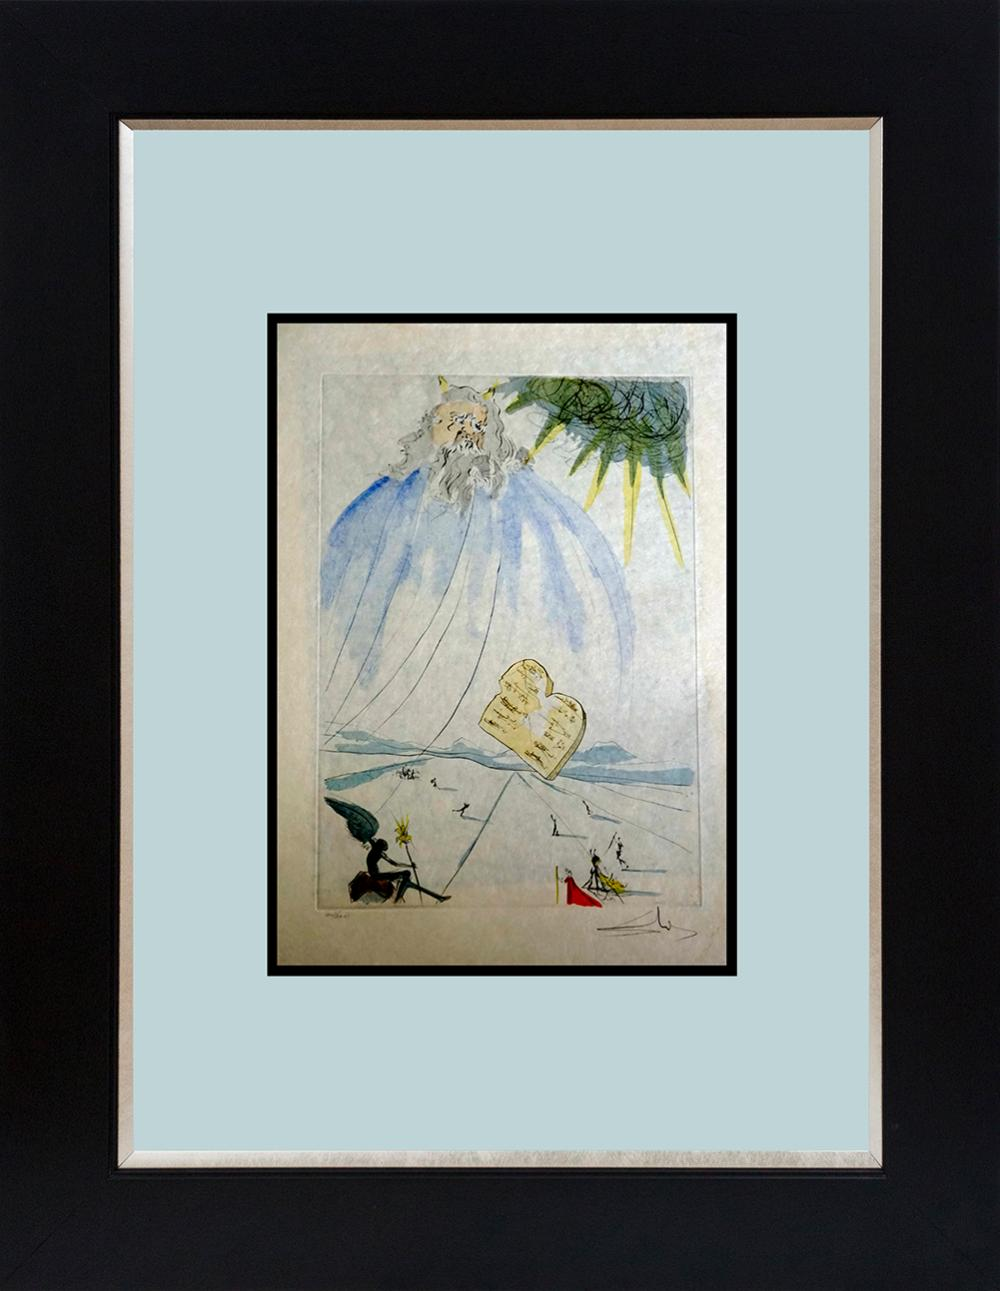 Lot 3526: Salvador Dali Limited Edition Lithograph